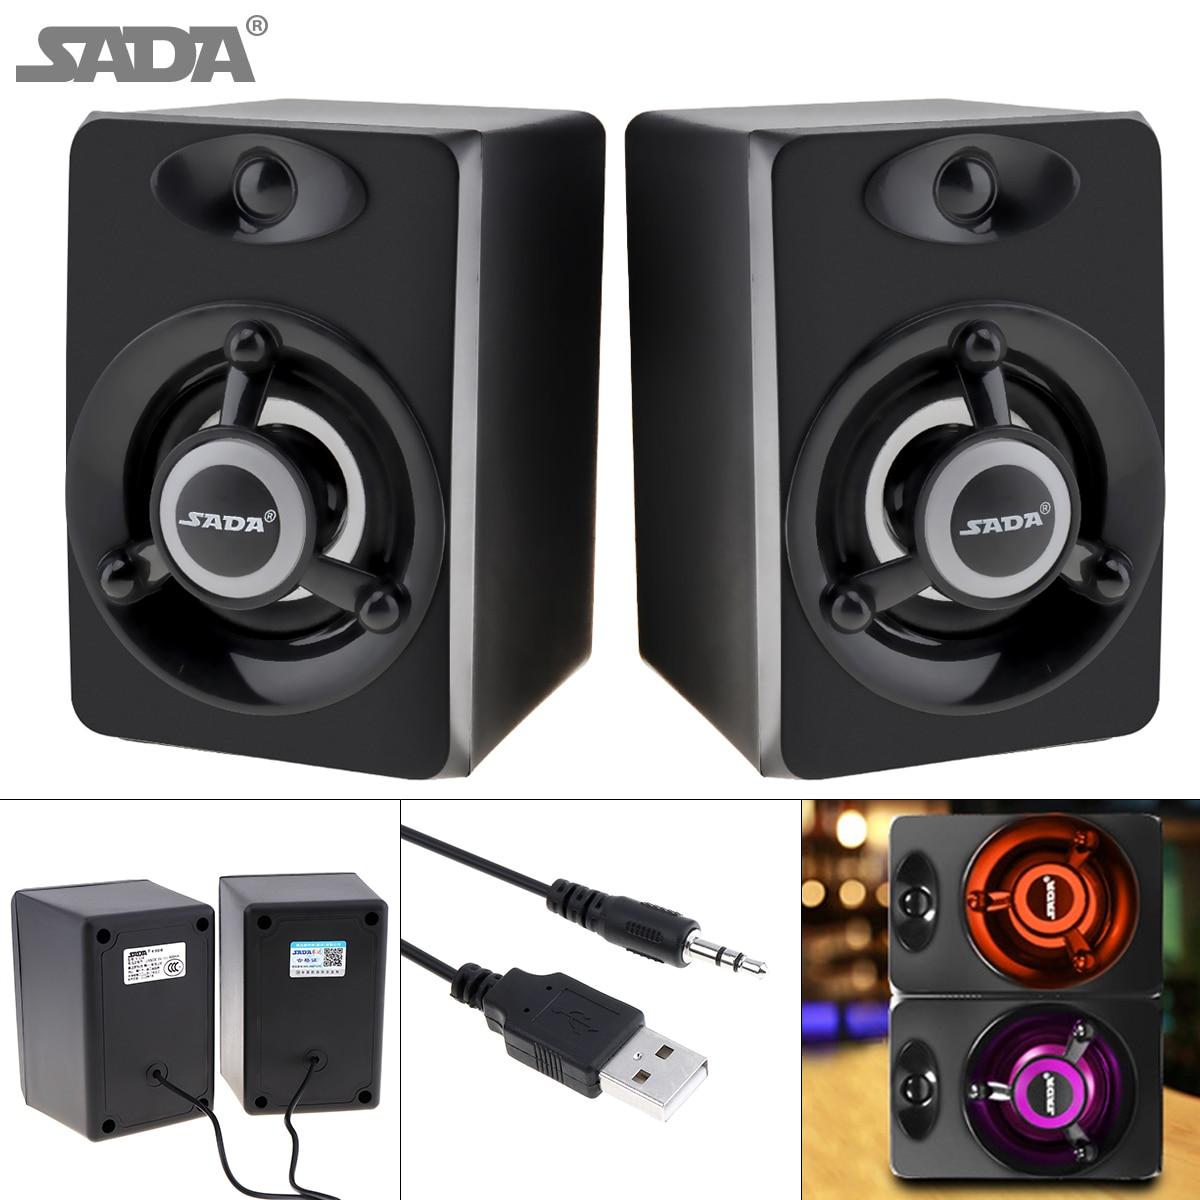 SADA 2018 Newest Subwoofer Deep Bass PC Speaker Portable Music DJ USB Soundar Computer Speakers For laptop Phone TV laptop speaker for dell xps l502x l501x left and right set subwoofer speakers